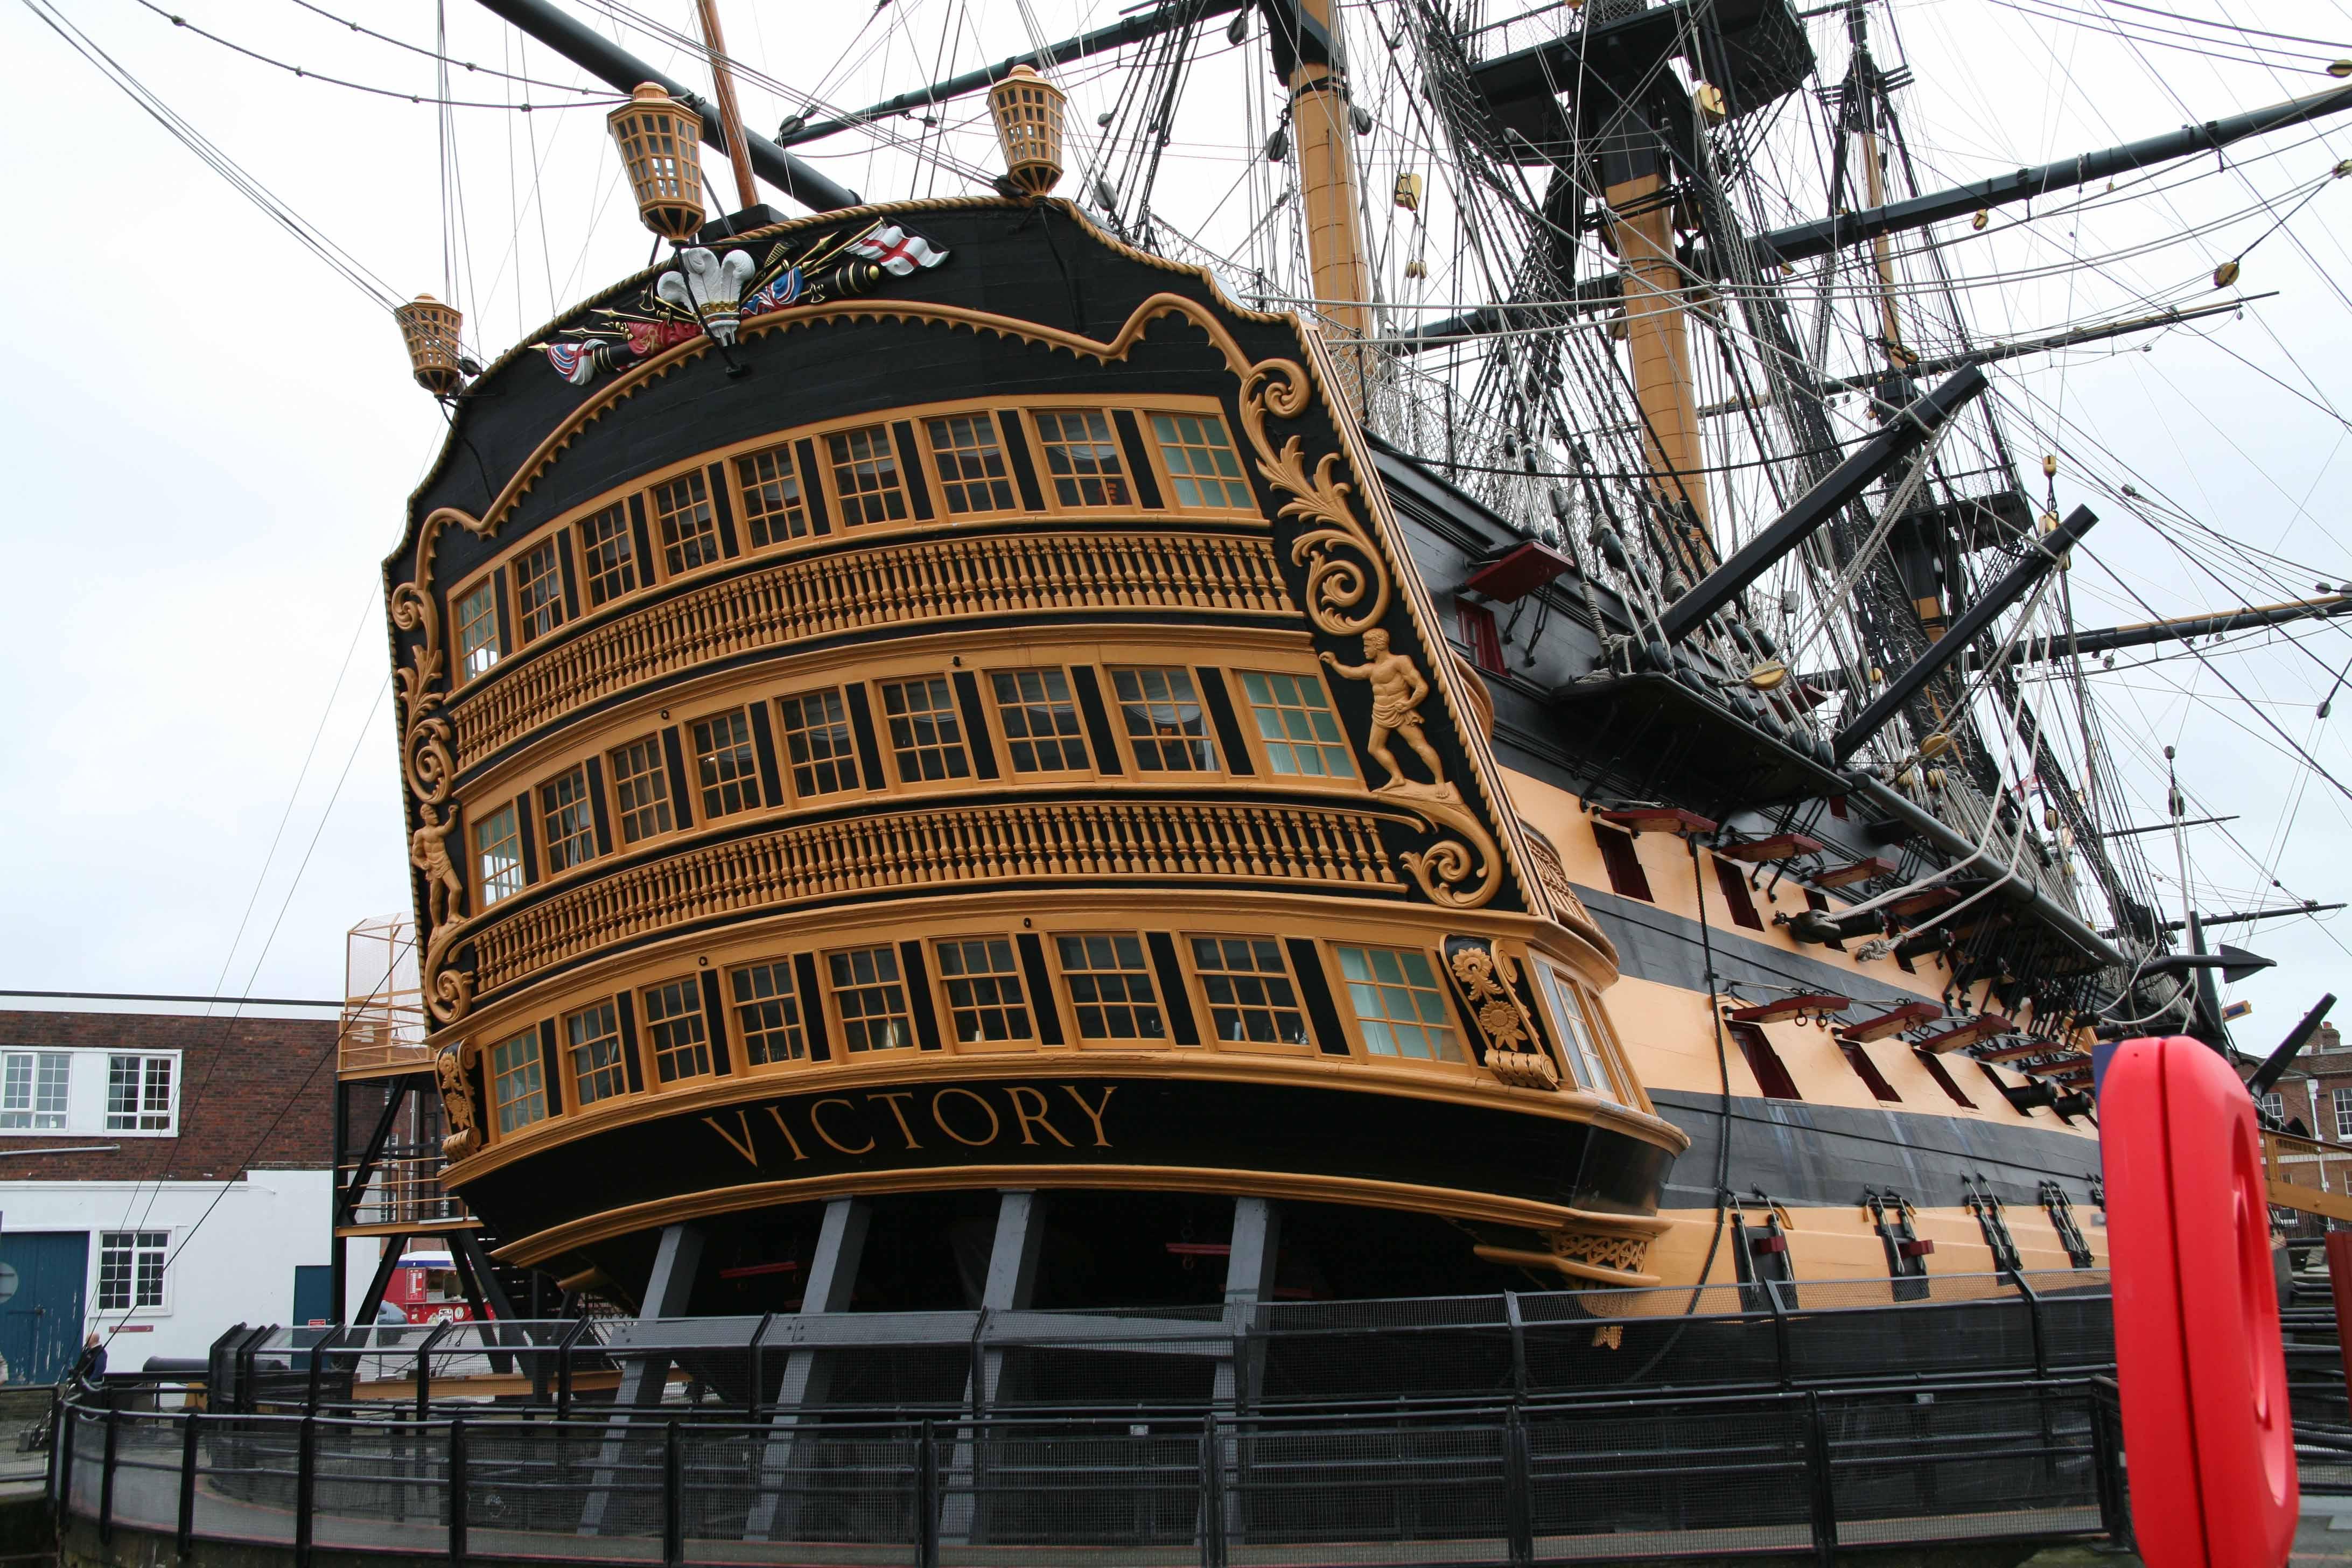 Photos hms victory portsmouth uk for Replica mobel england